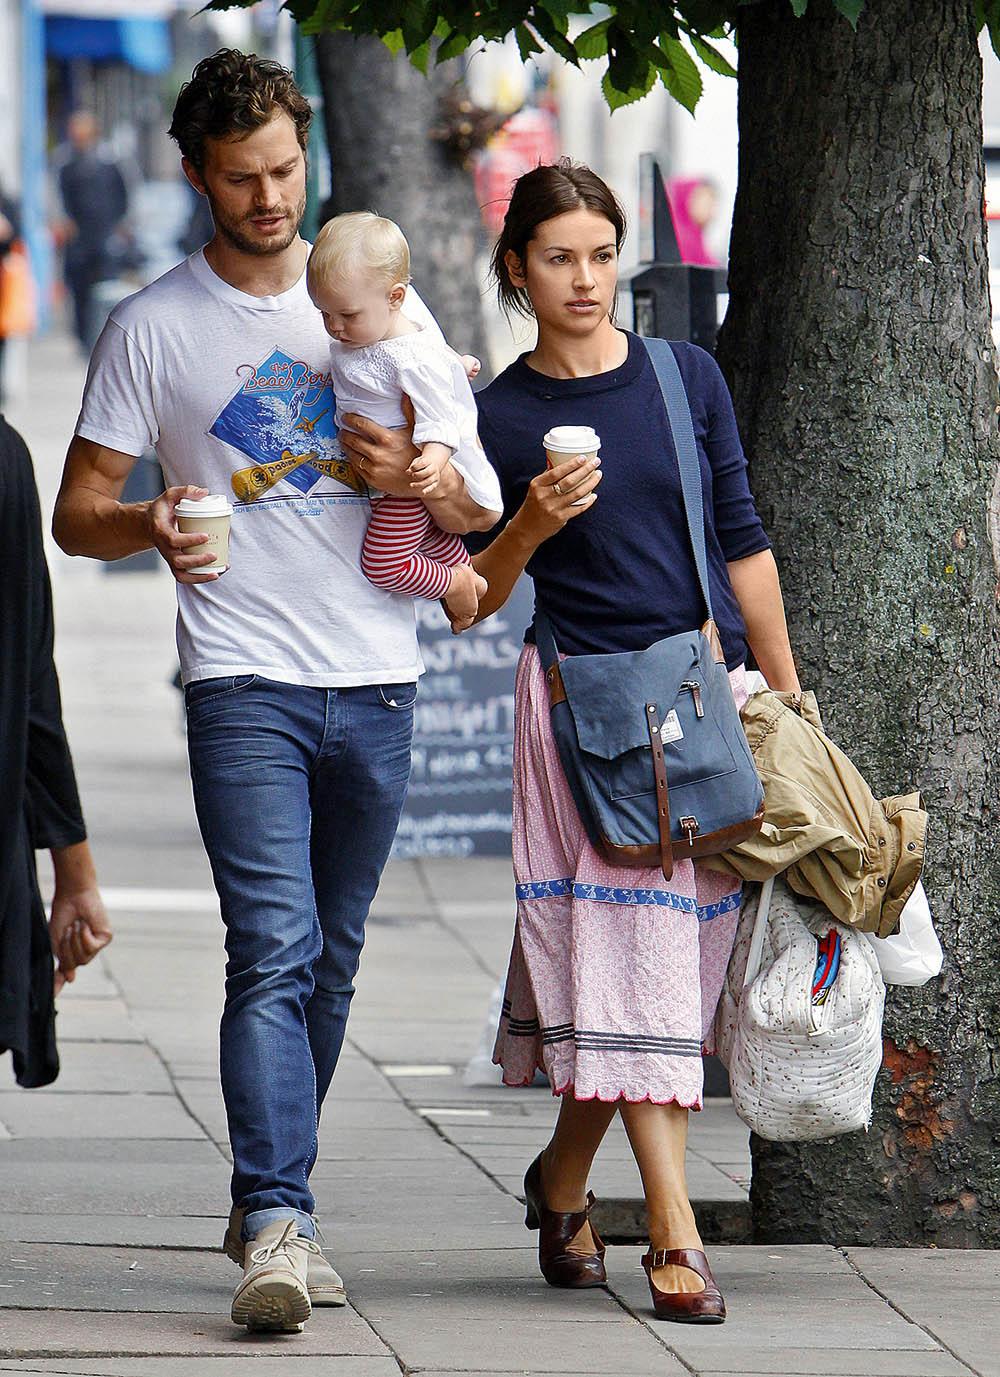 Джейми Дорнан с женой Амелией Уорнер и дочкой Далси, август 2014 г.